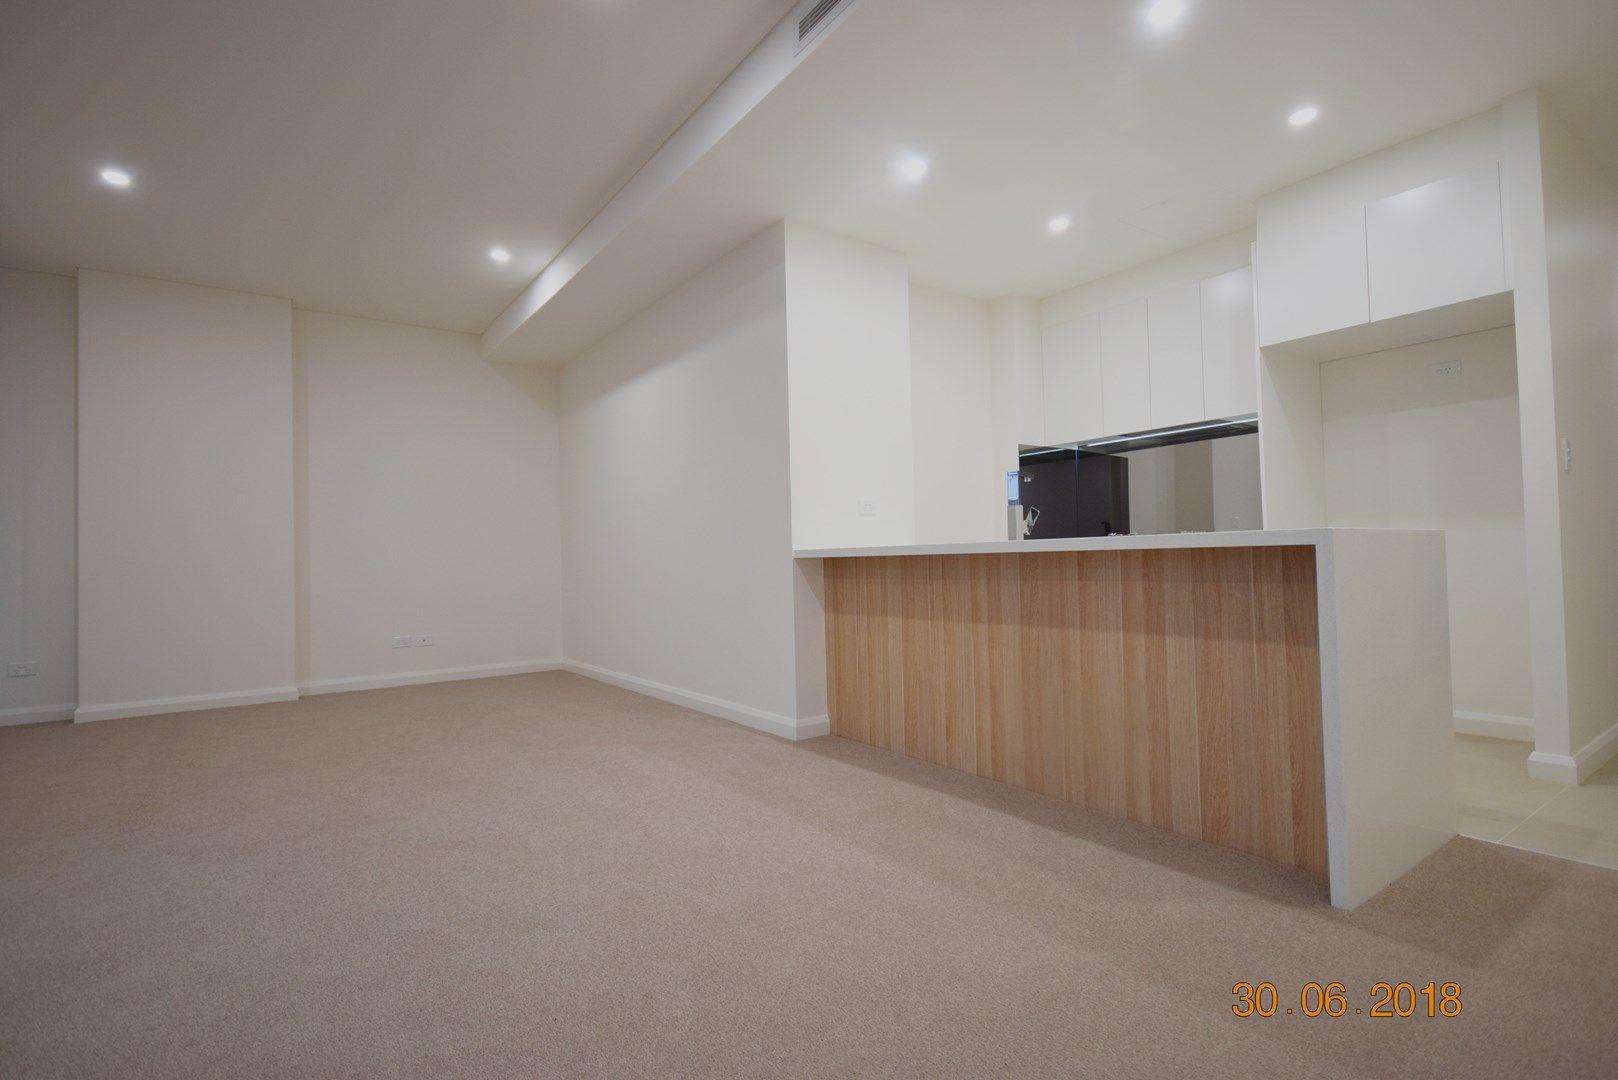 G05/27 Merriwa St, Gordon NSW 2072, Image 0